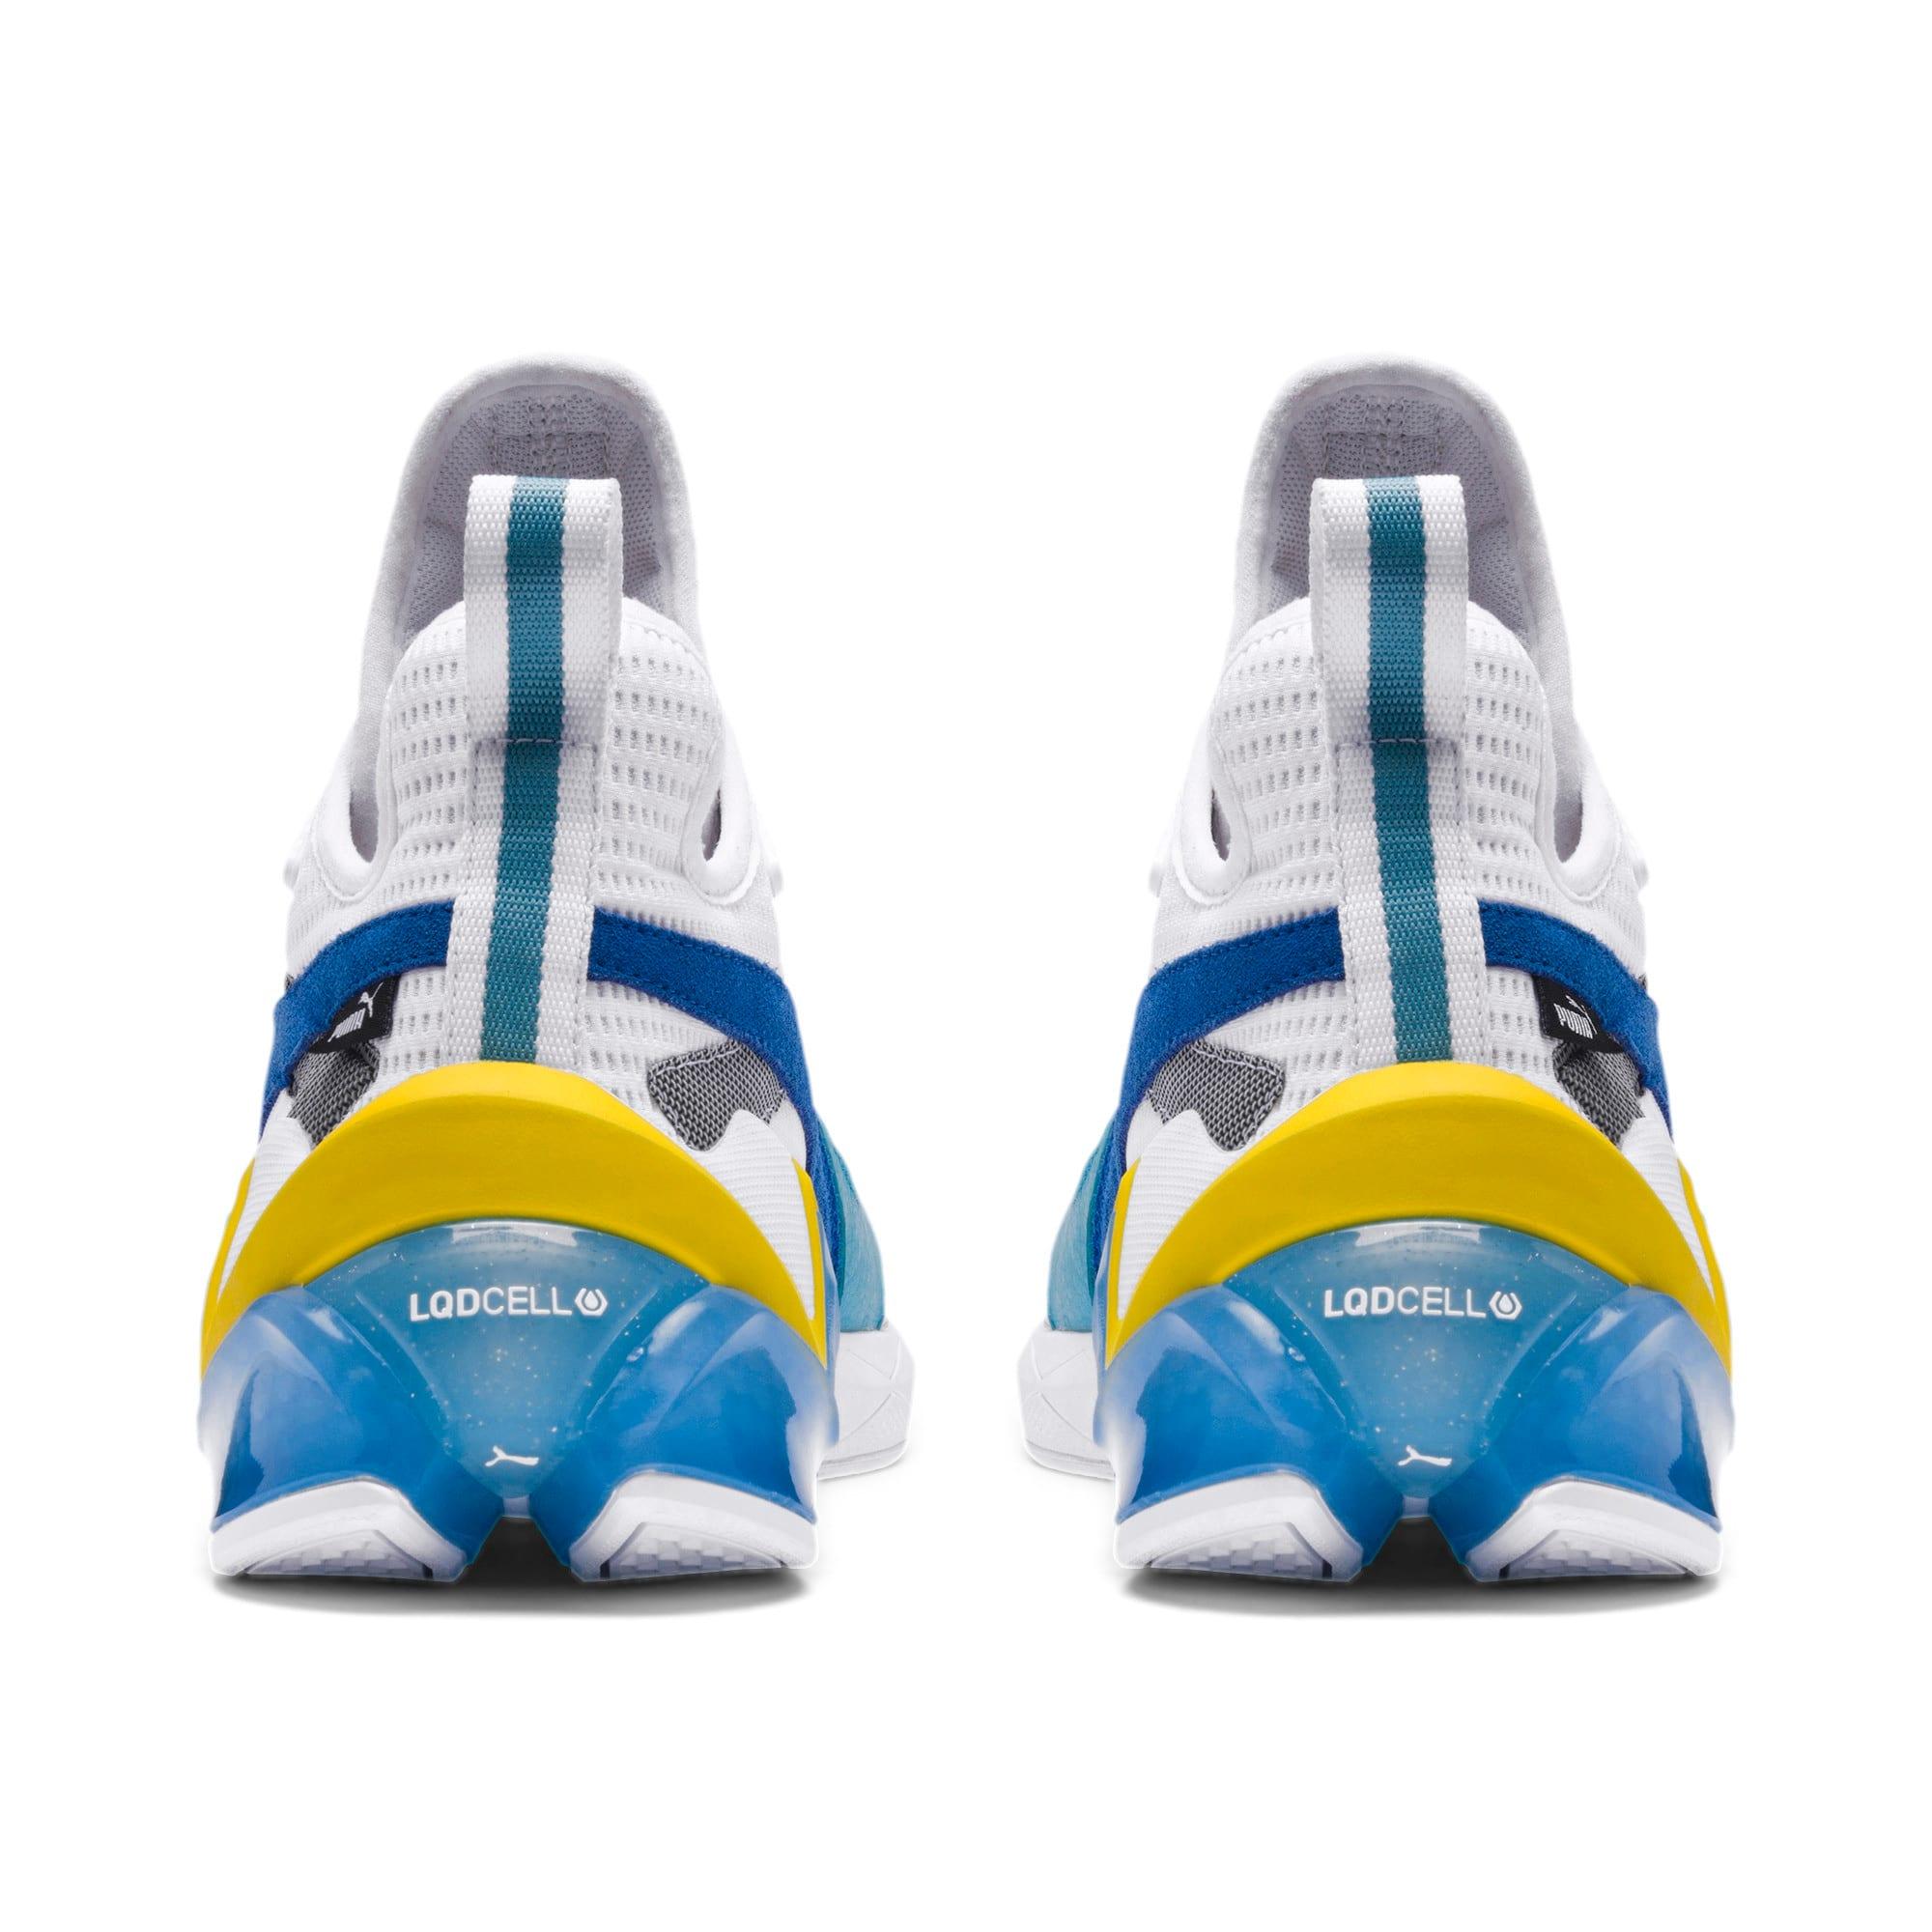 Thumbnail 3 of LQDCELL Origin Herren Sneaker, Puma White-B Blue-Blz Yellow, medium